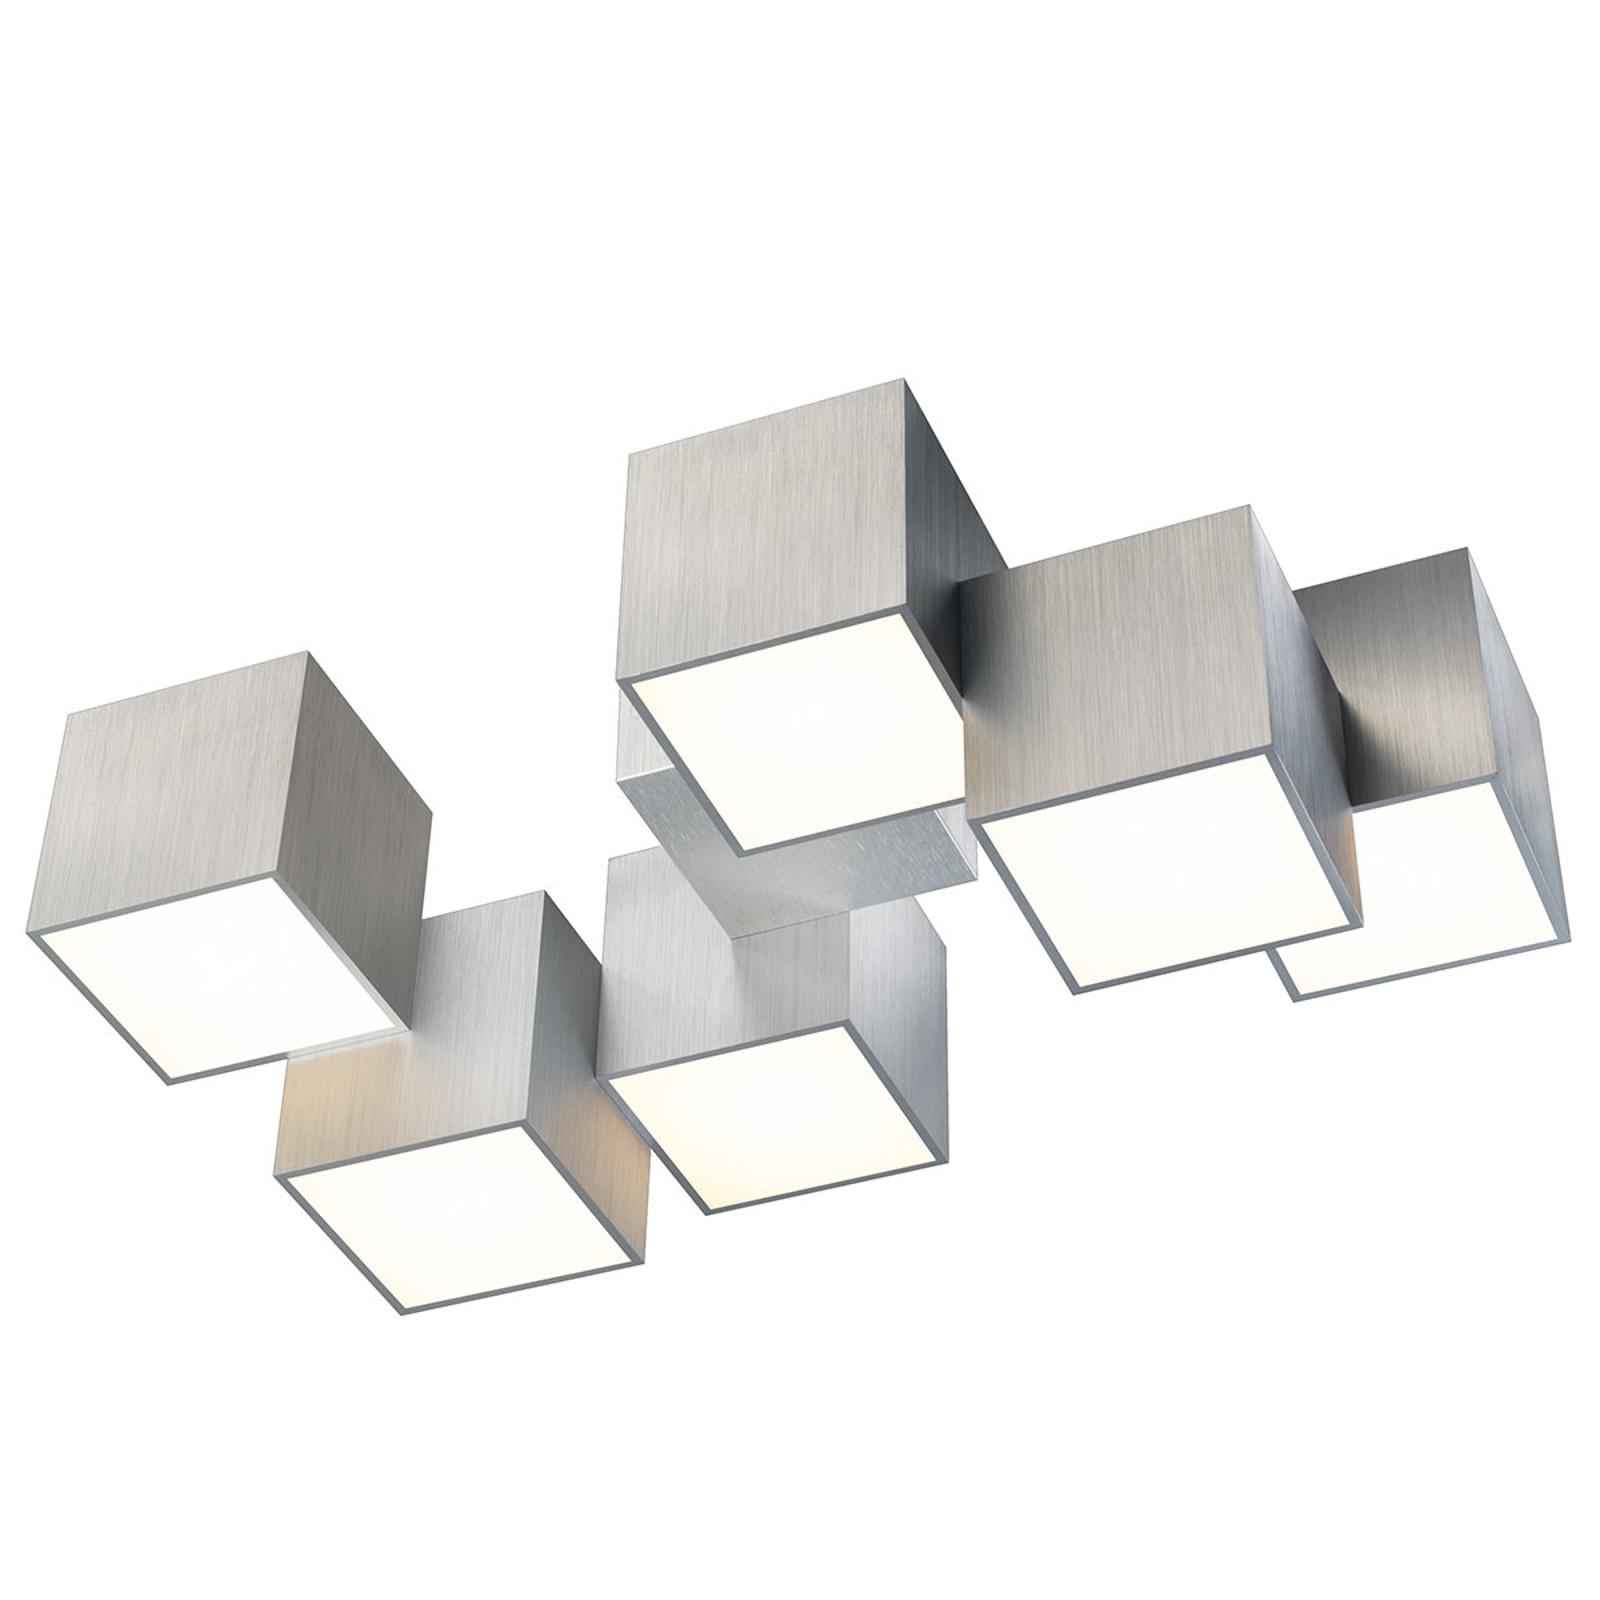 GROSSMANN Rocks plafonnier à 6 lampes aluminium